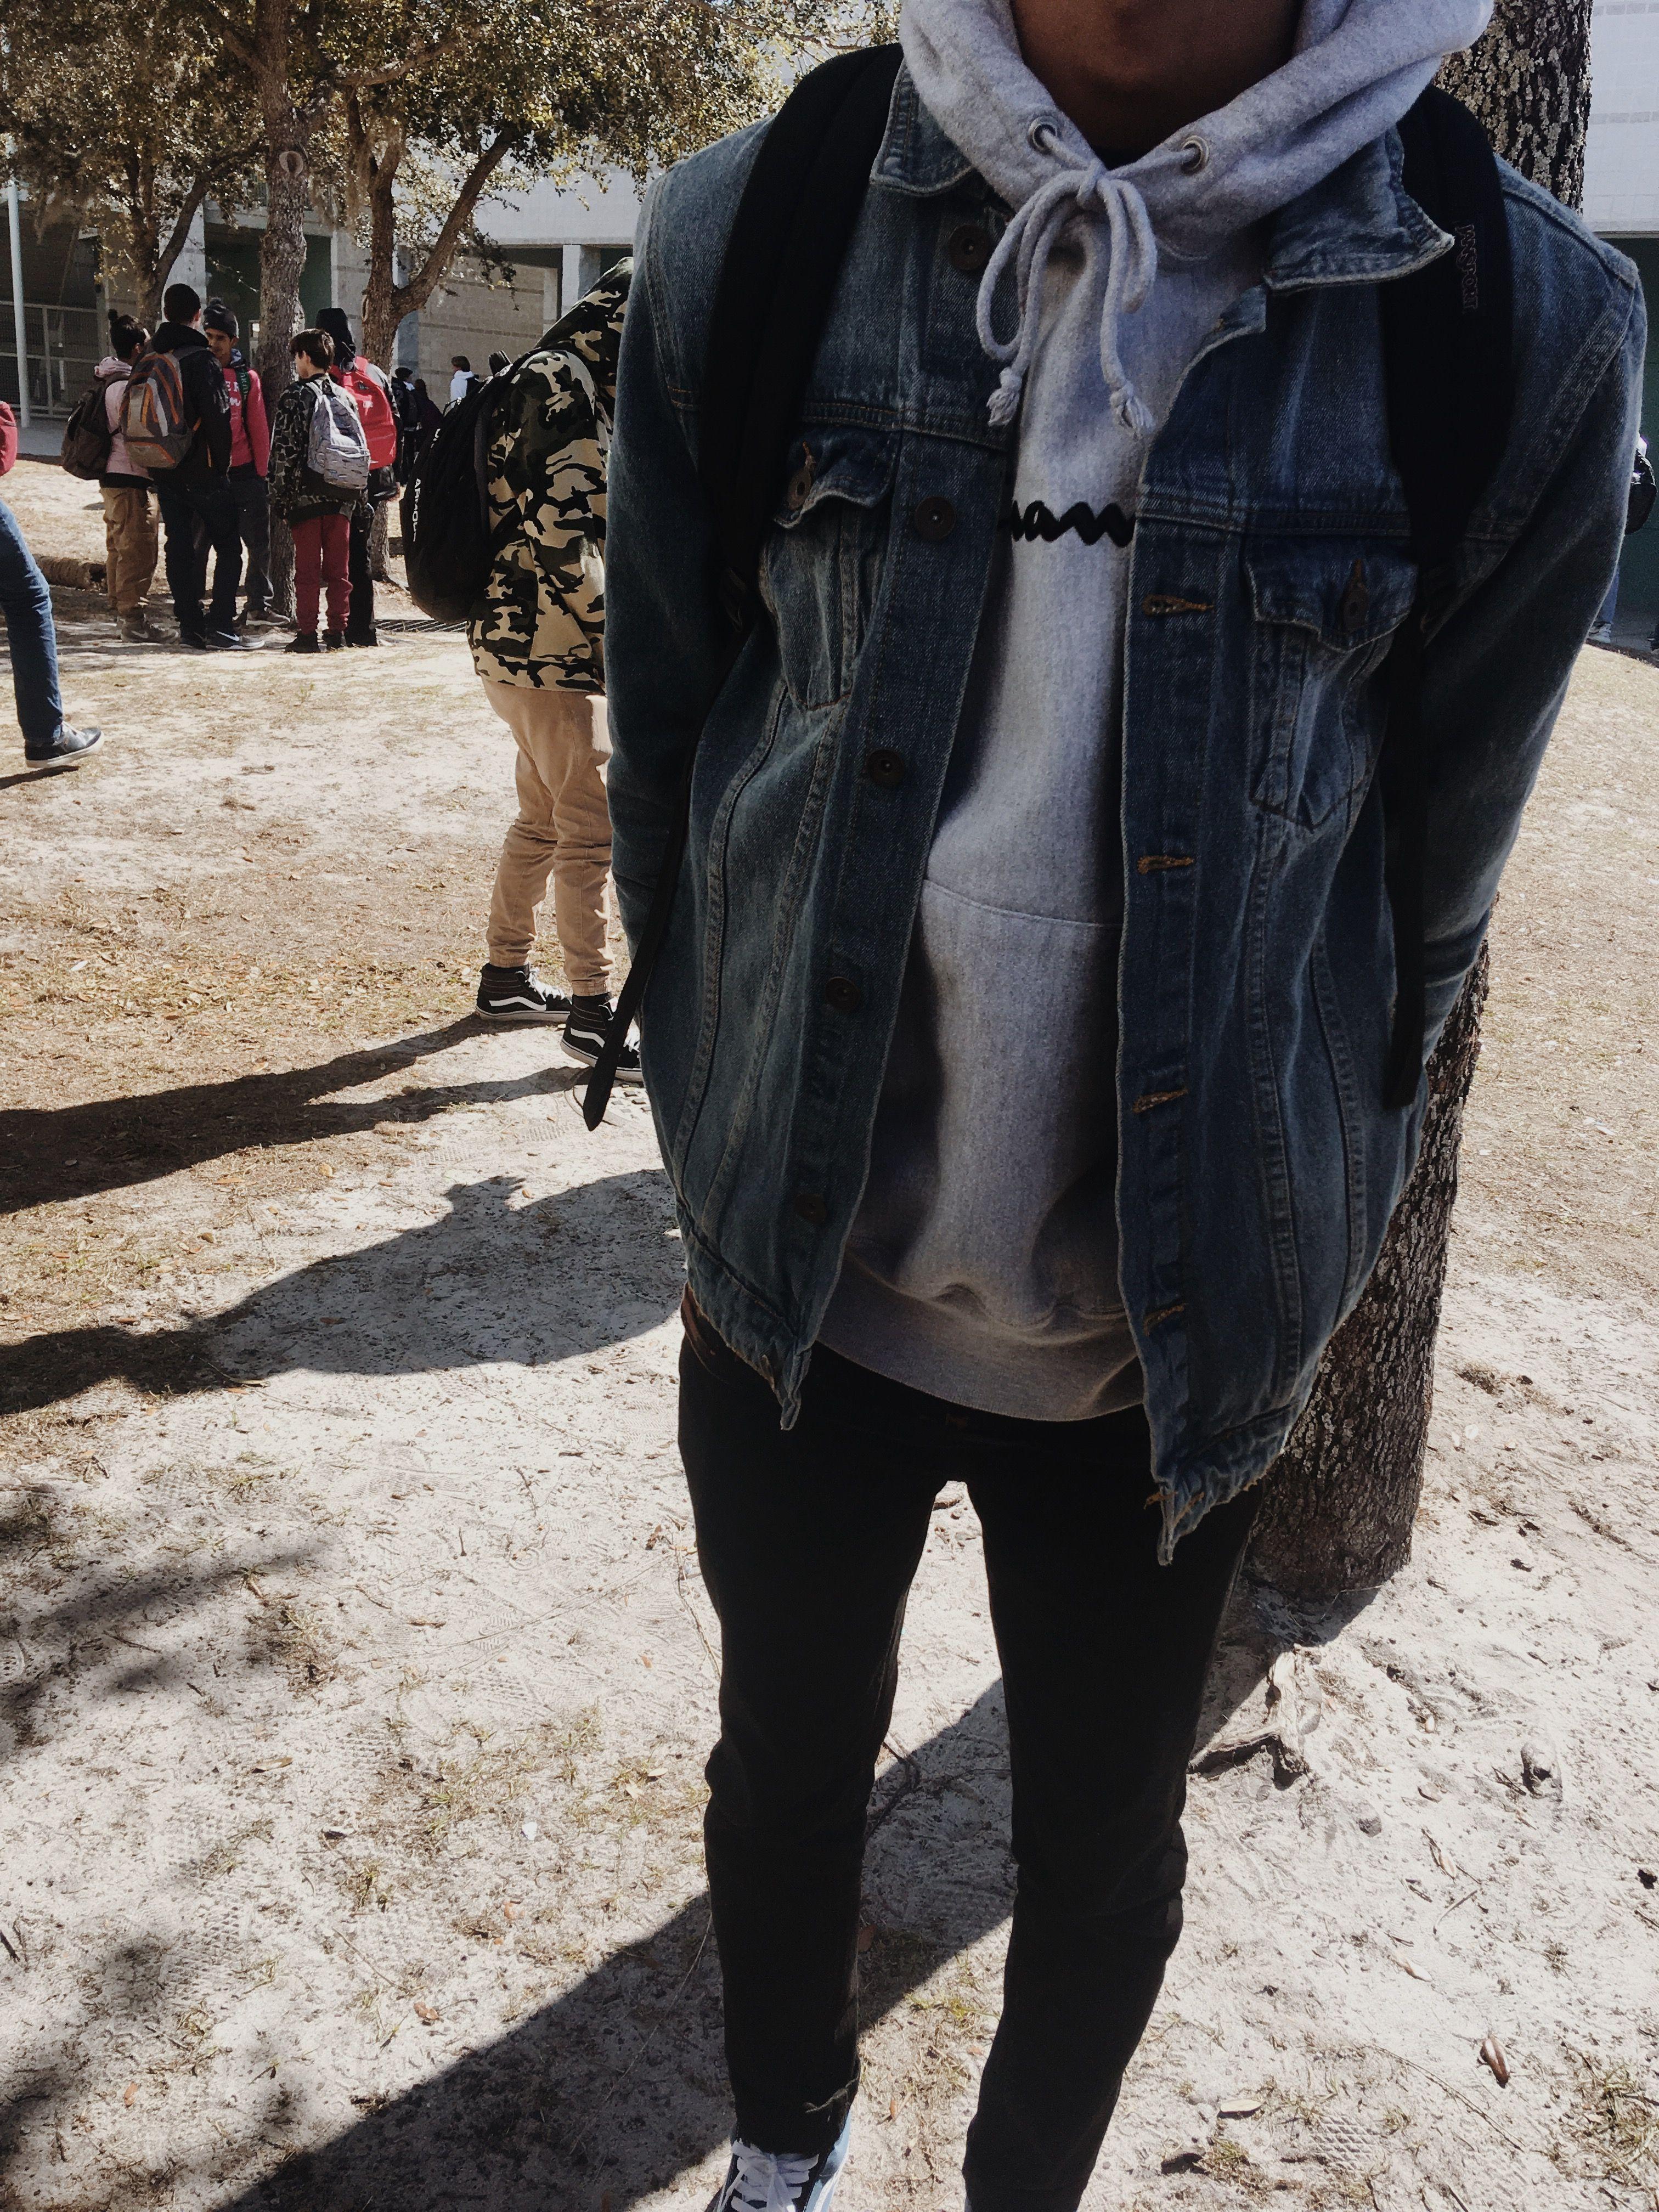 Levi Jean Jacket Champion Hoodie Zara Jeans Hoodie Zara Levi Jean Jacket Fashion [ 4032 x 3024 Pixel ]